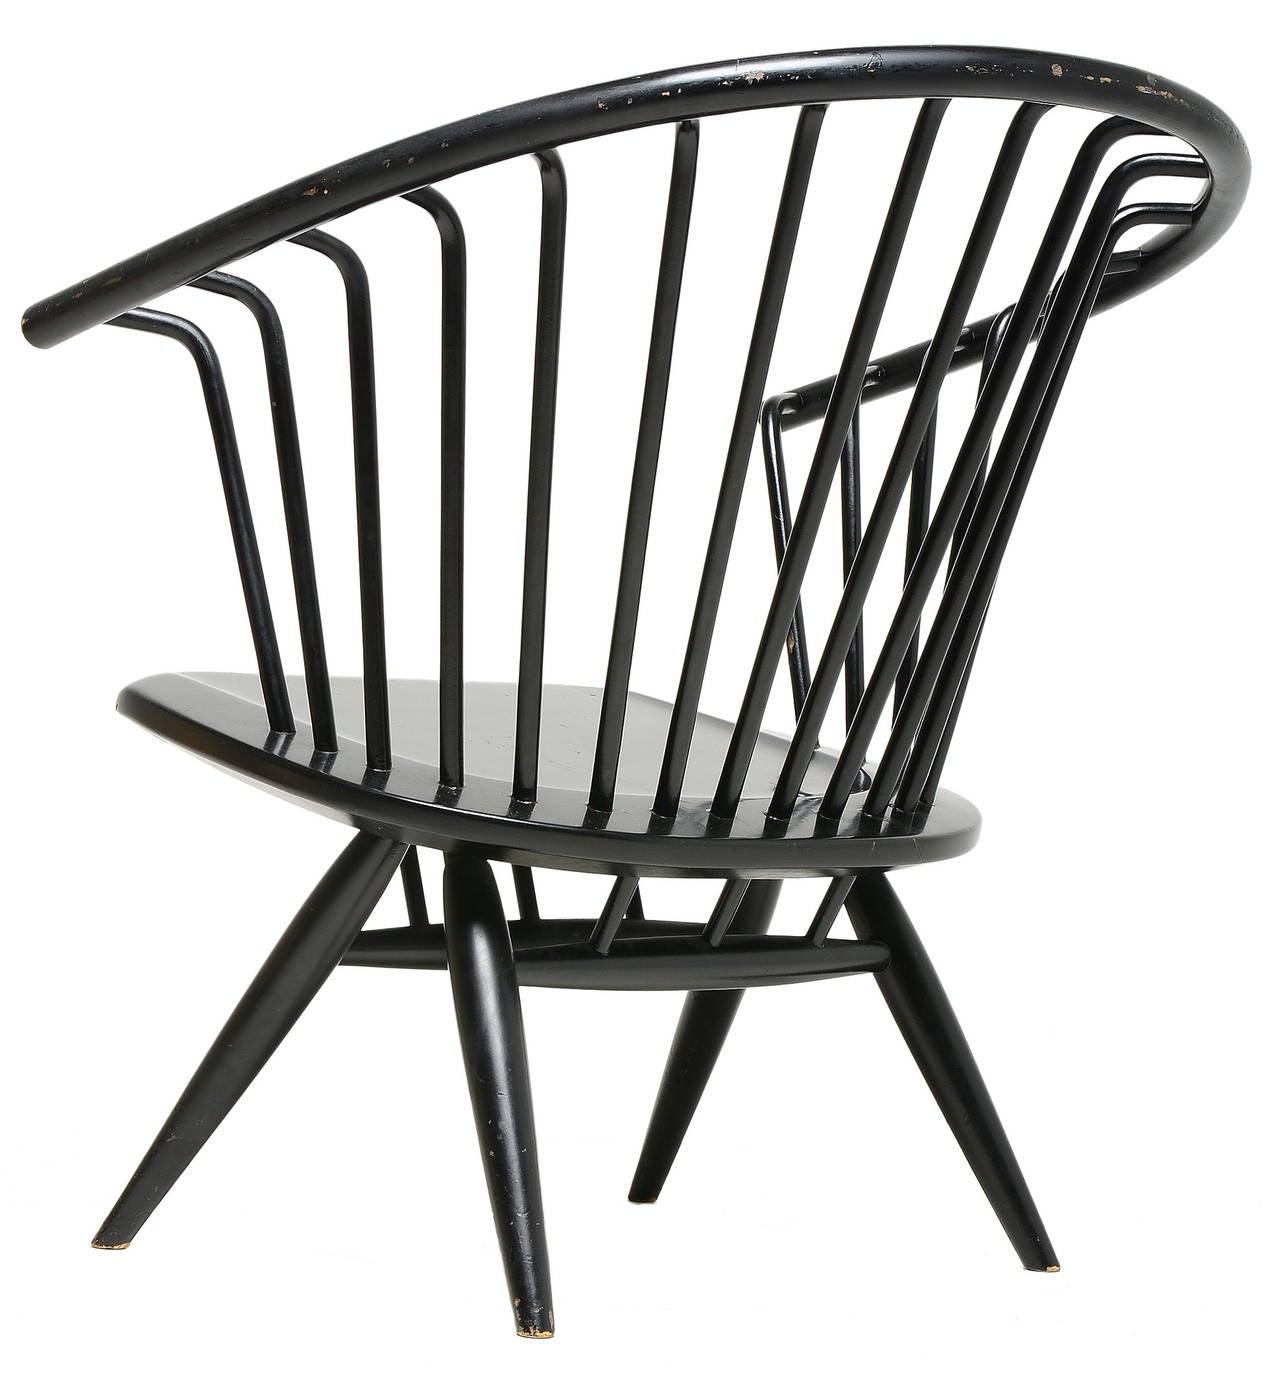 Scandinavian Modern Ilmari Tapiovaara Crinolette Lounge Chair For Sale